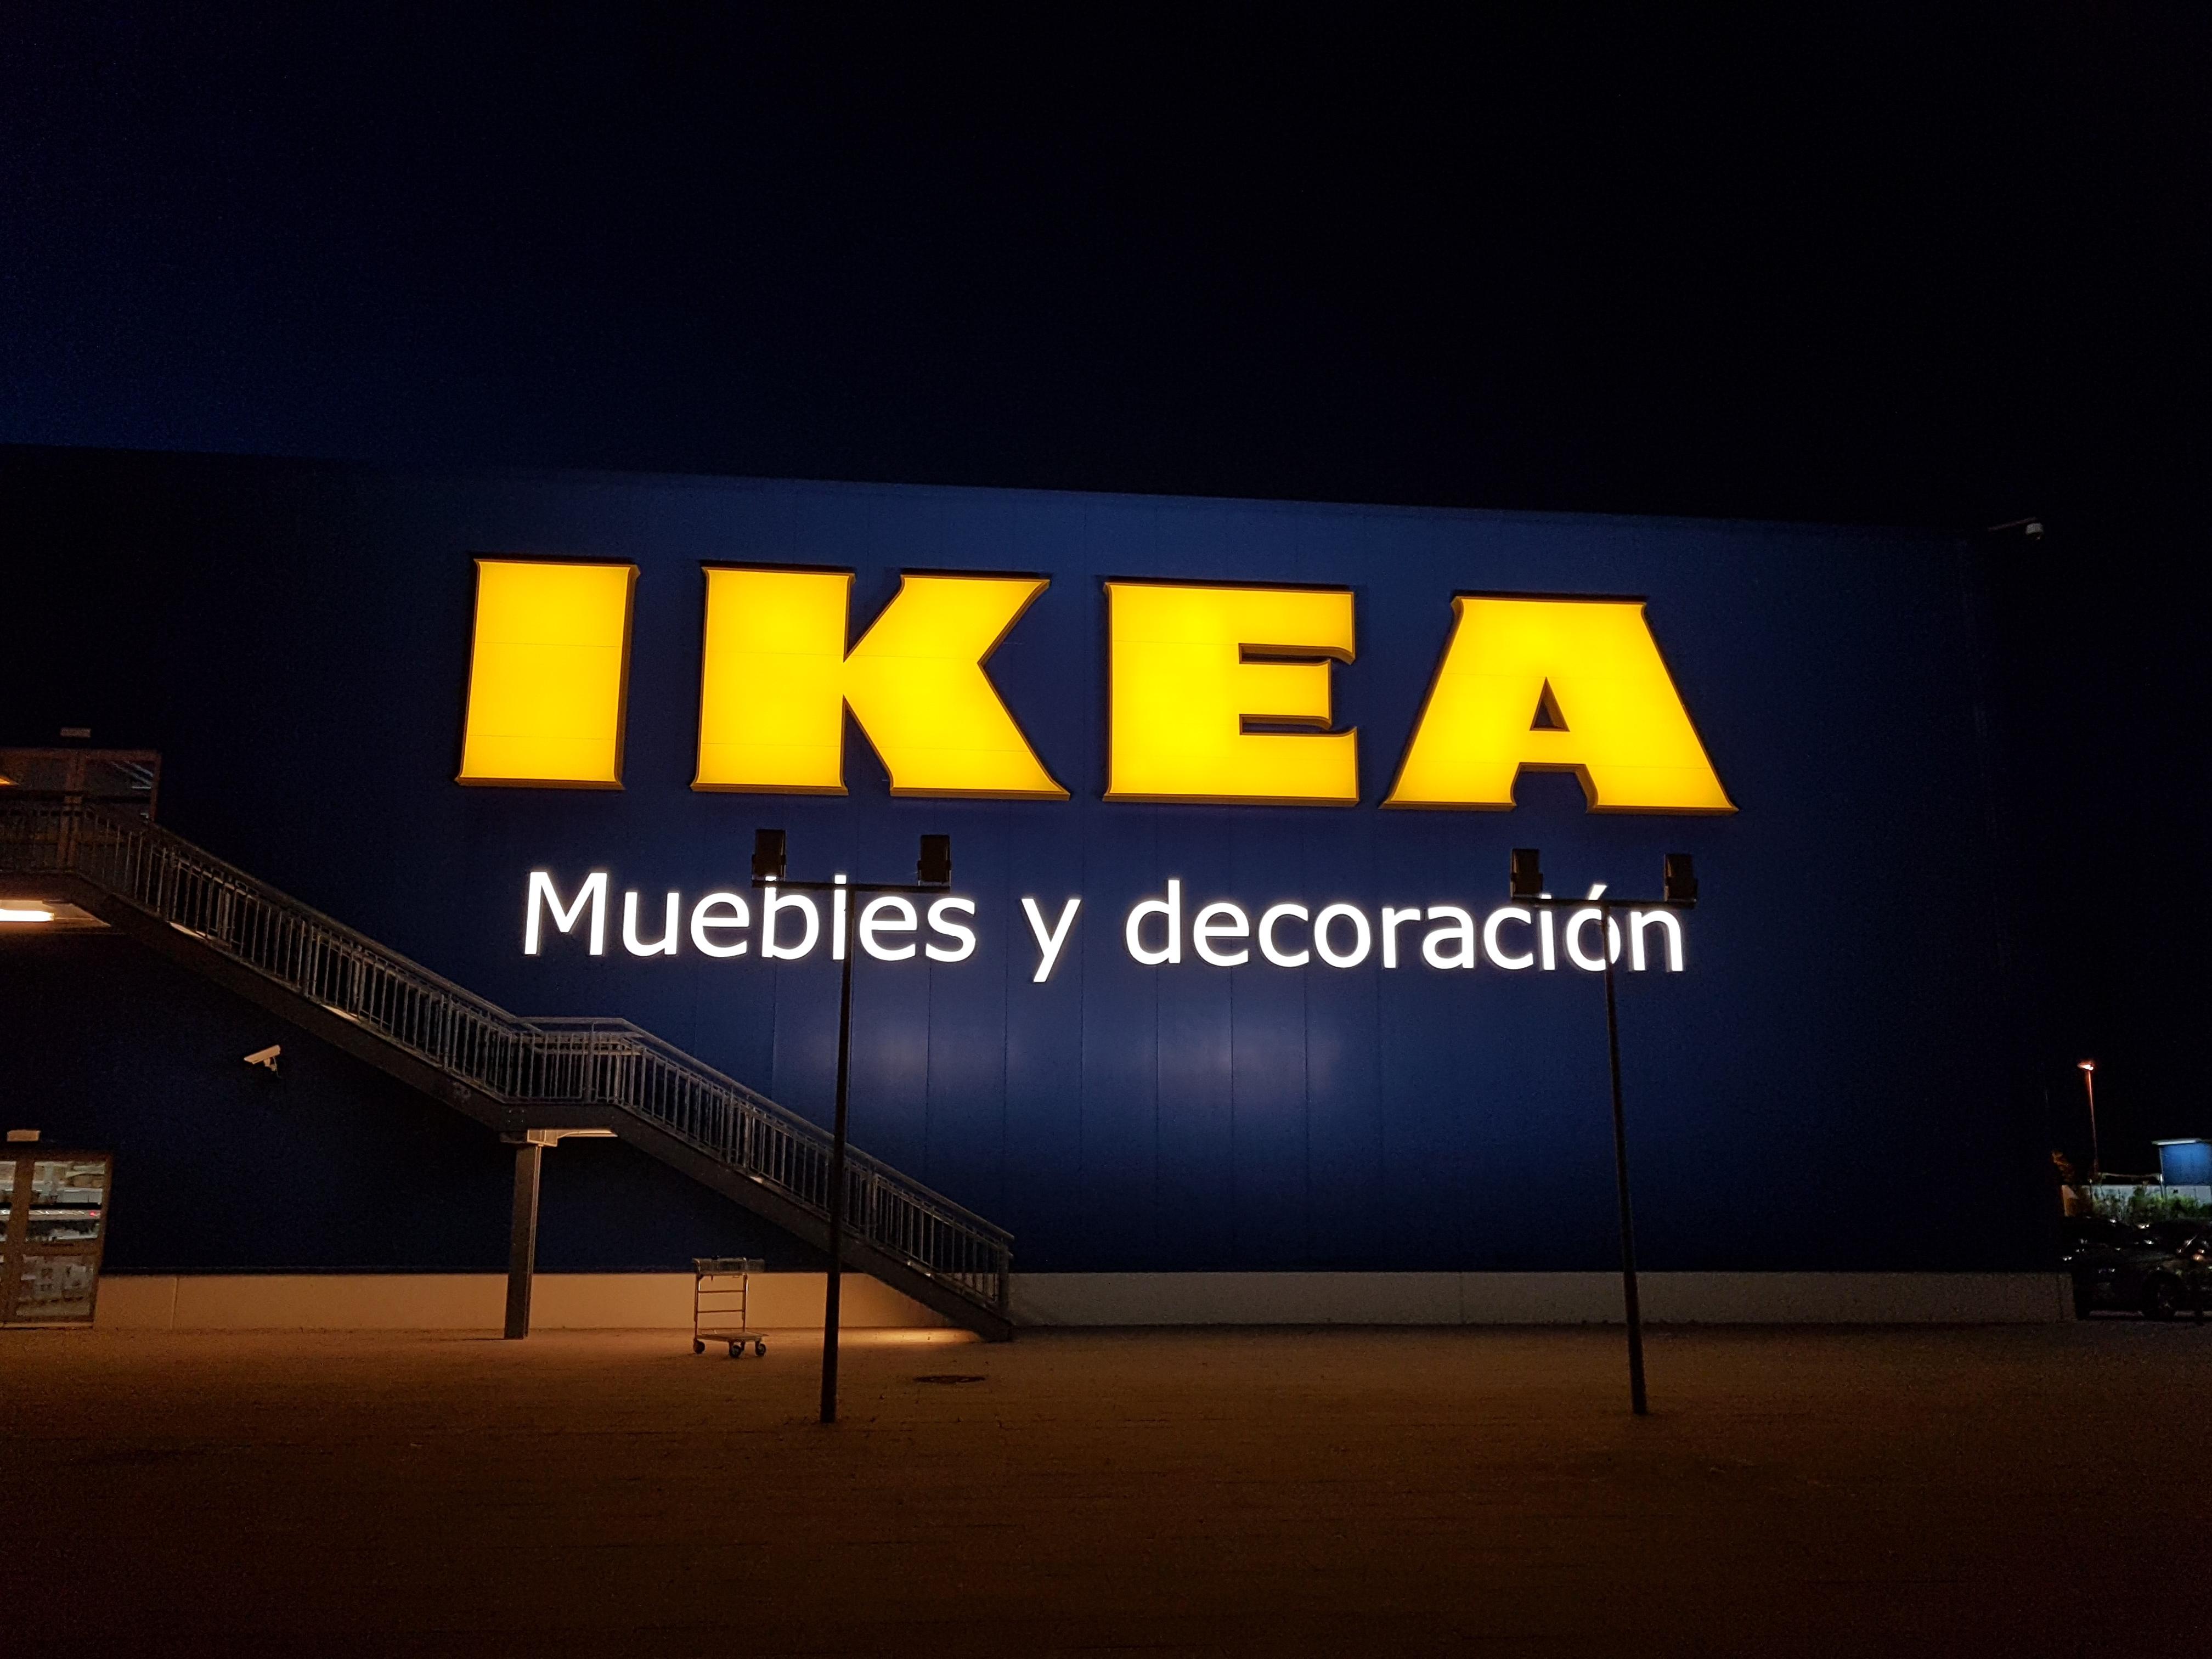 IKEA - Jerez Illuminated Sign 1